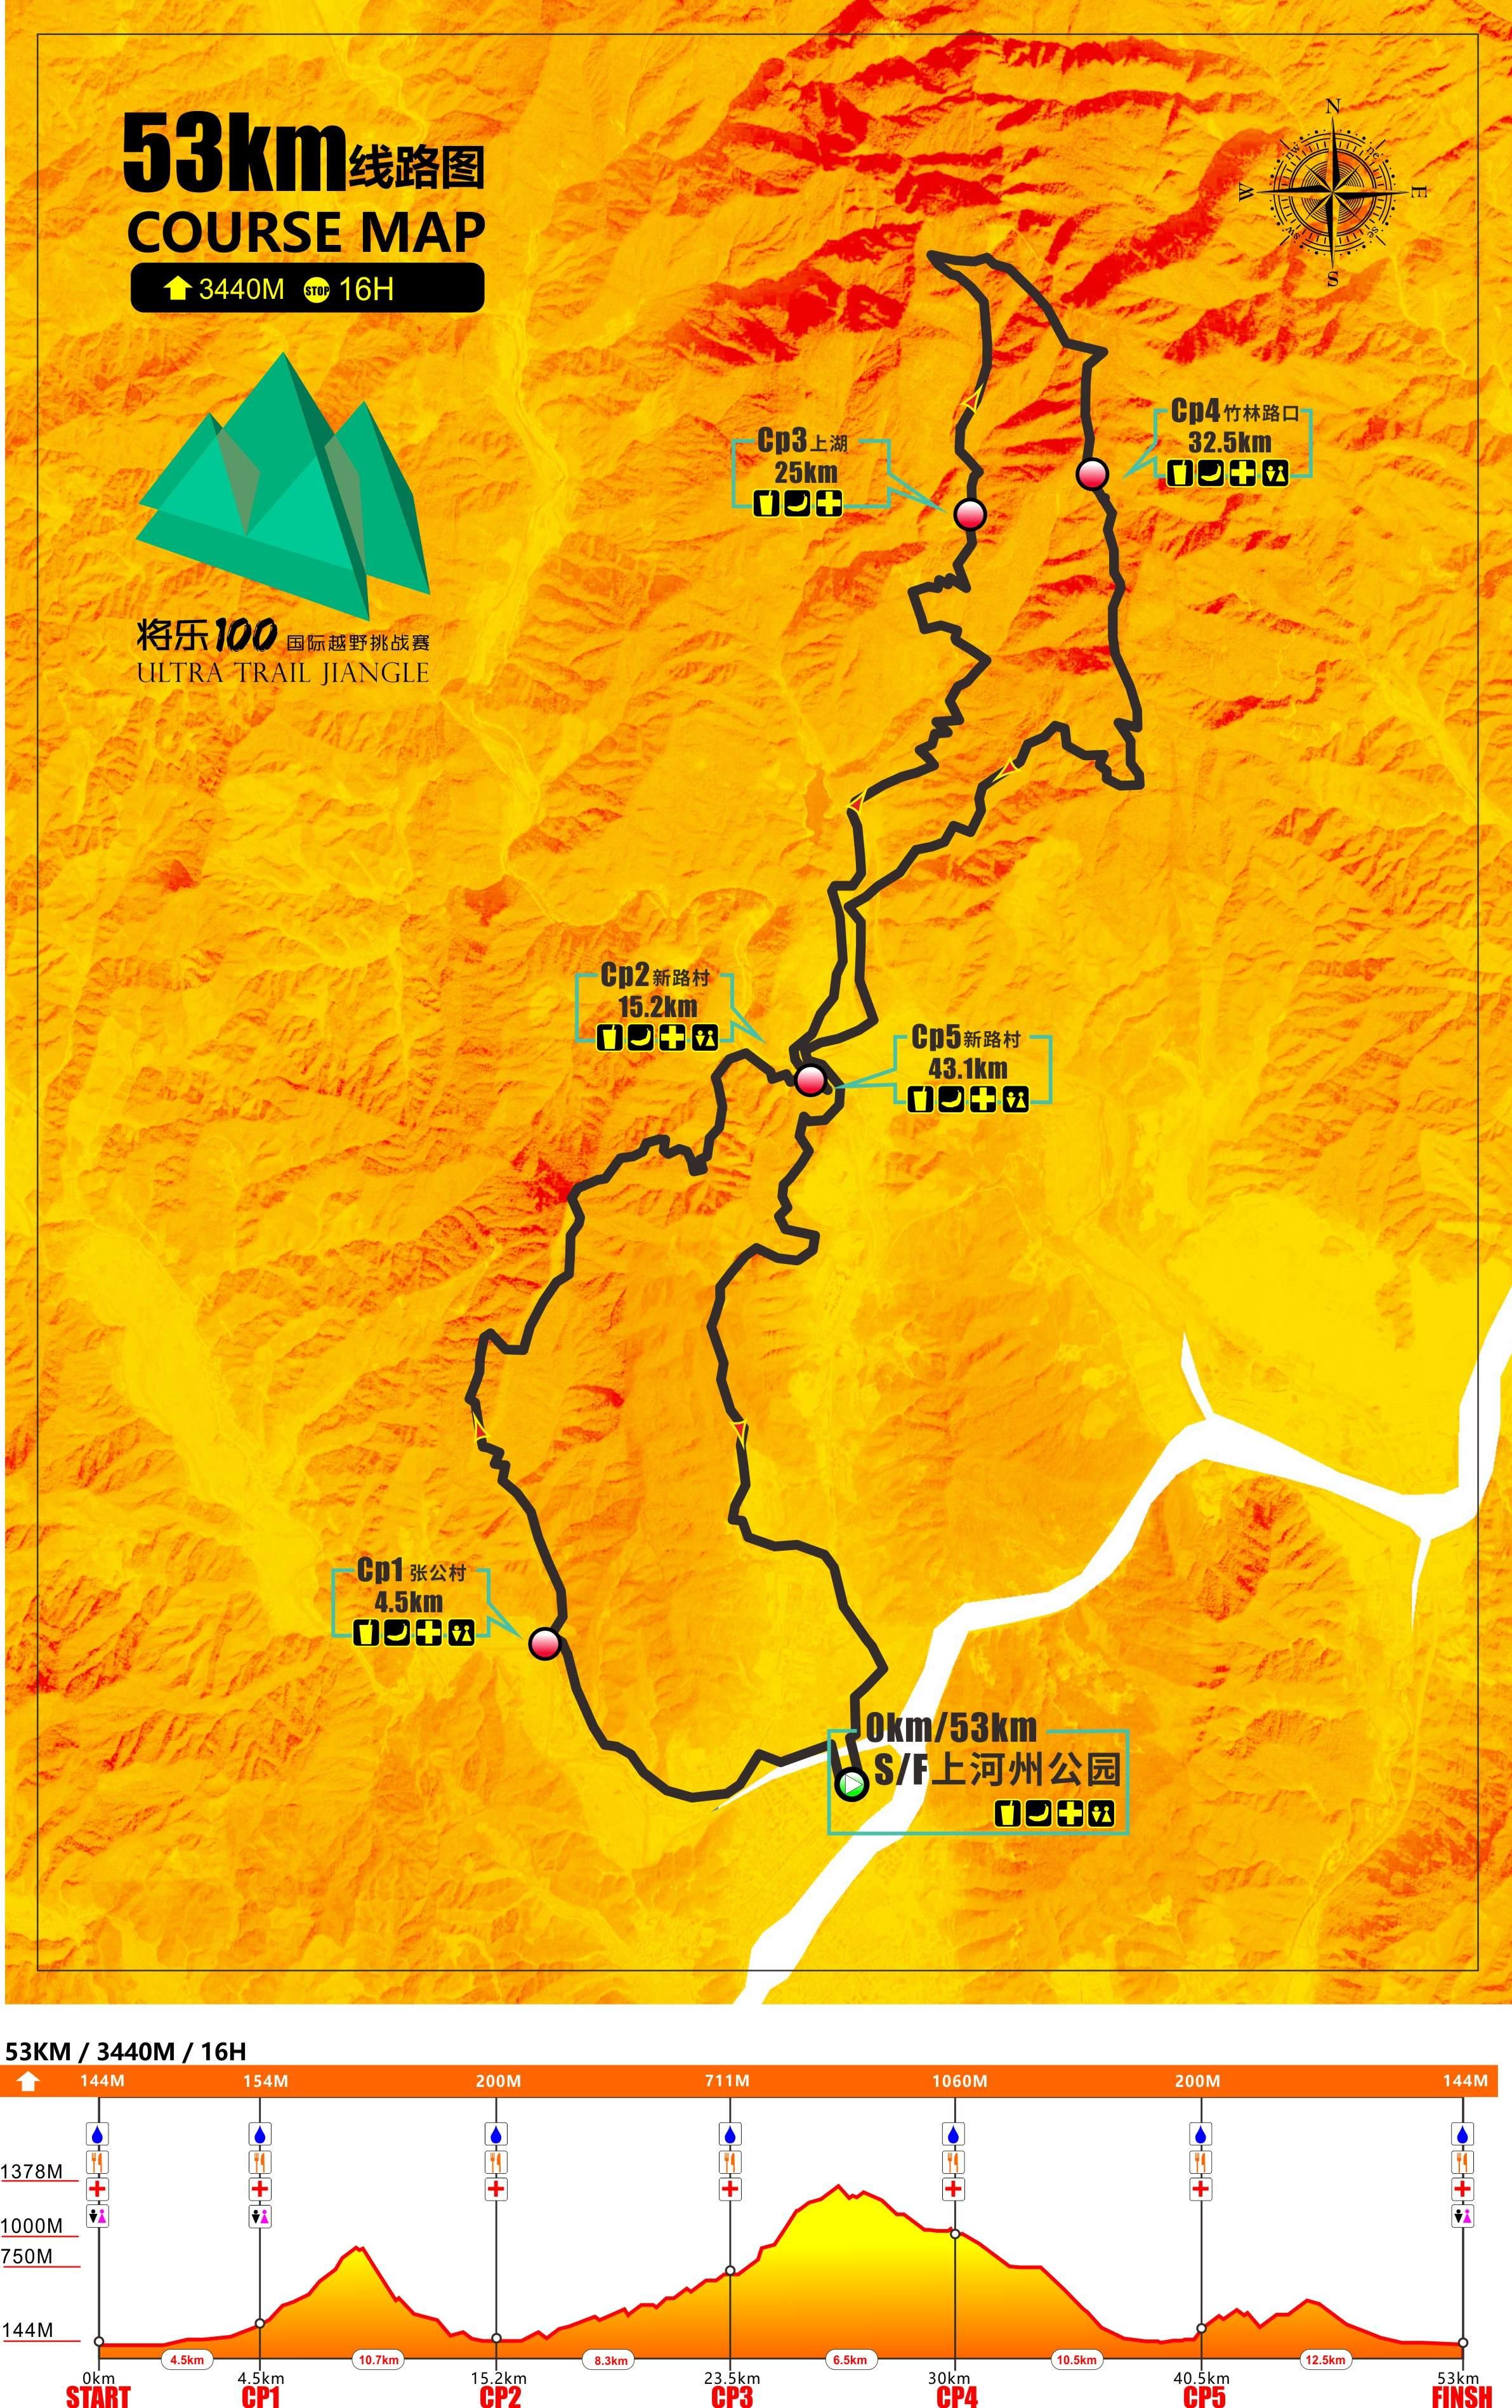 17-50km路线.jpg